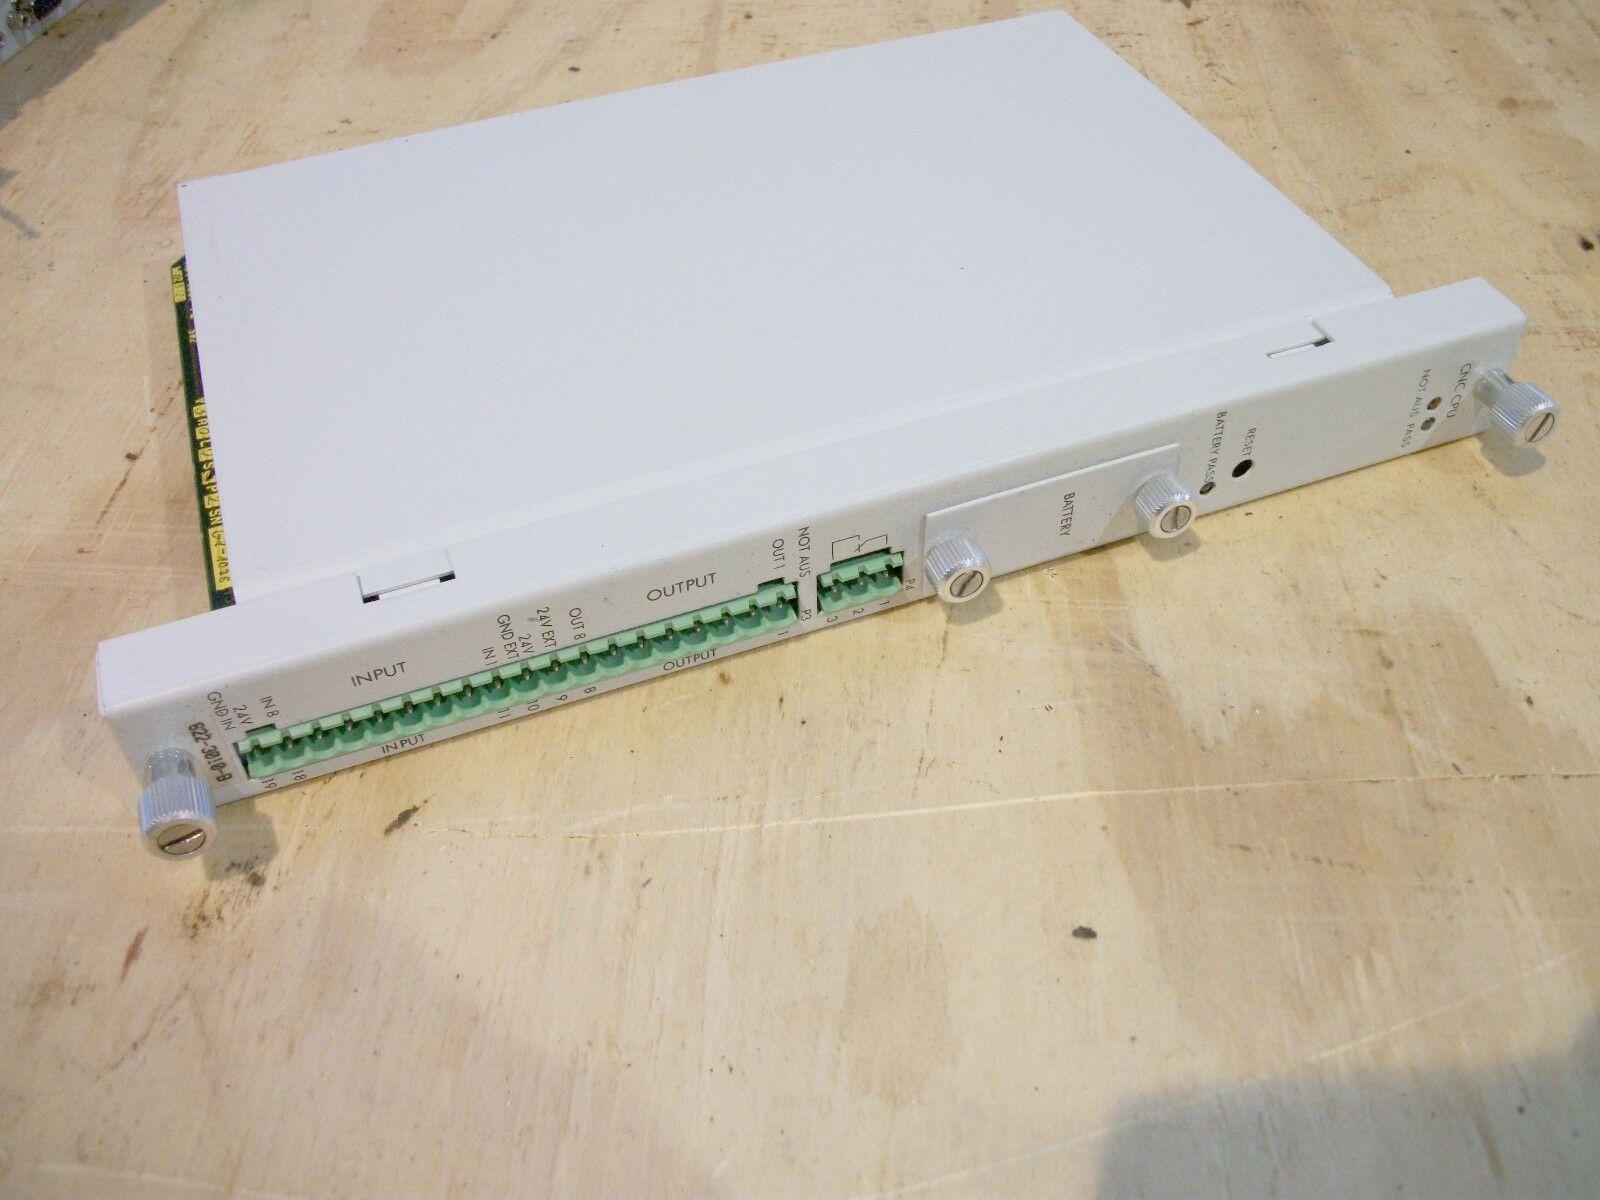 Honeywell CNC # 52-1061, 622-3010 CNC # 52-1061, 622-3010